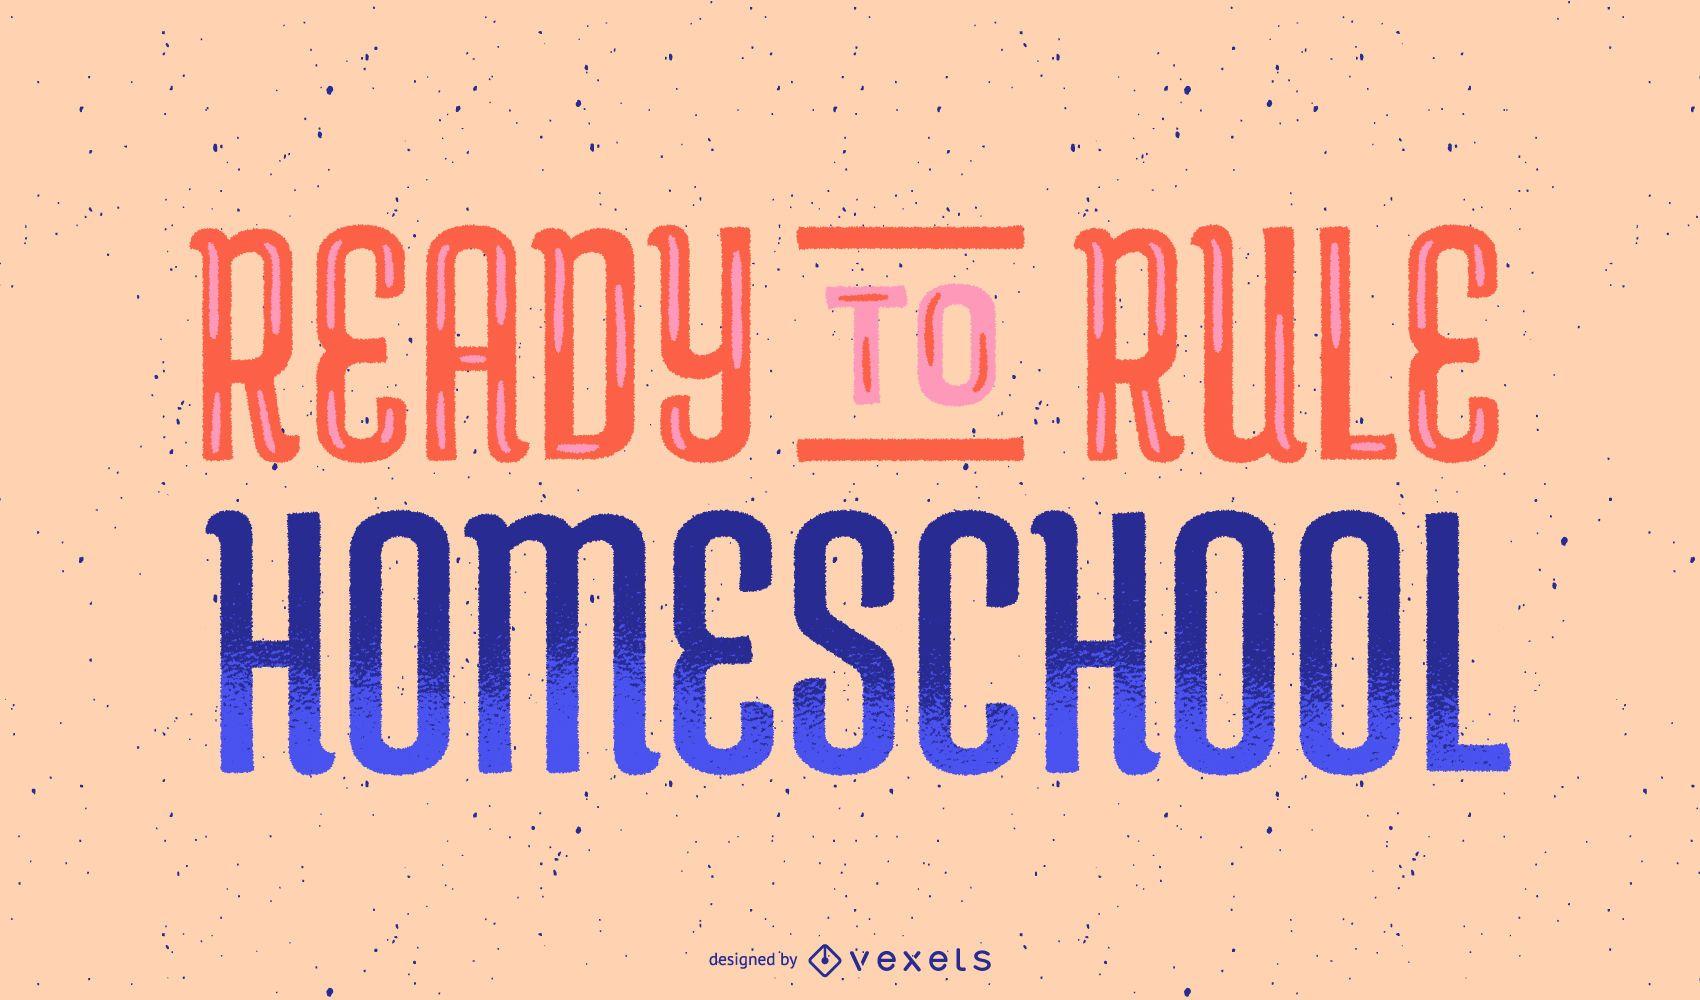 Rule homeschool lettering design